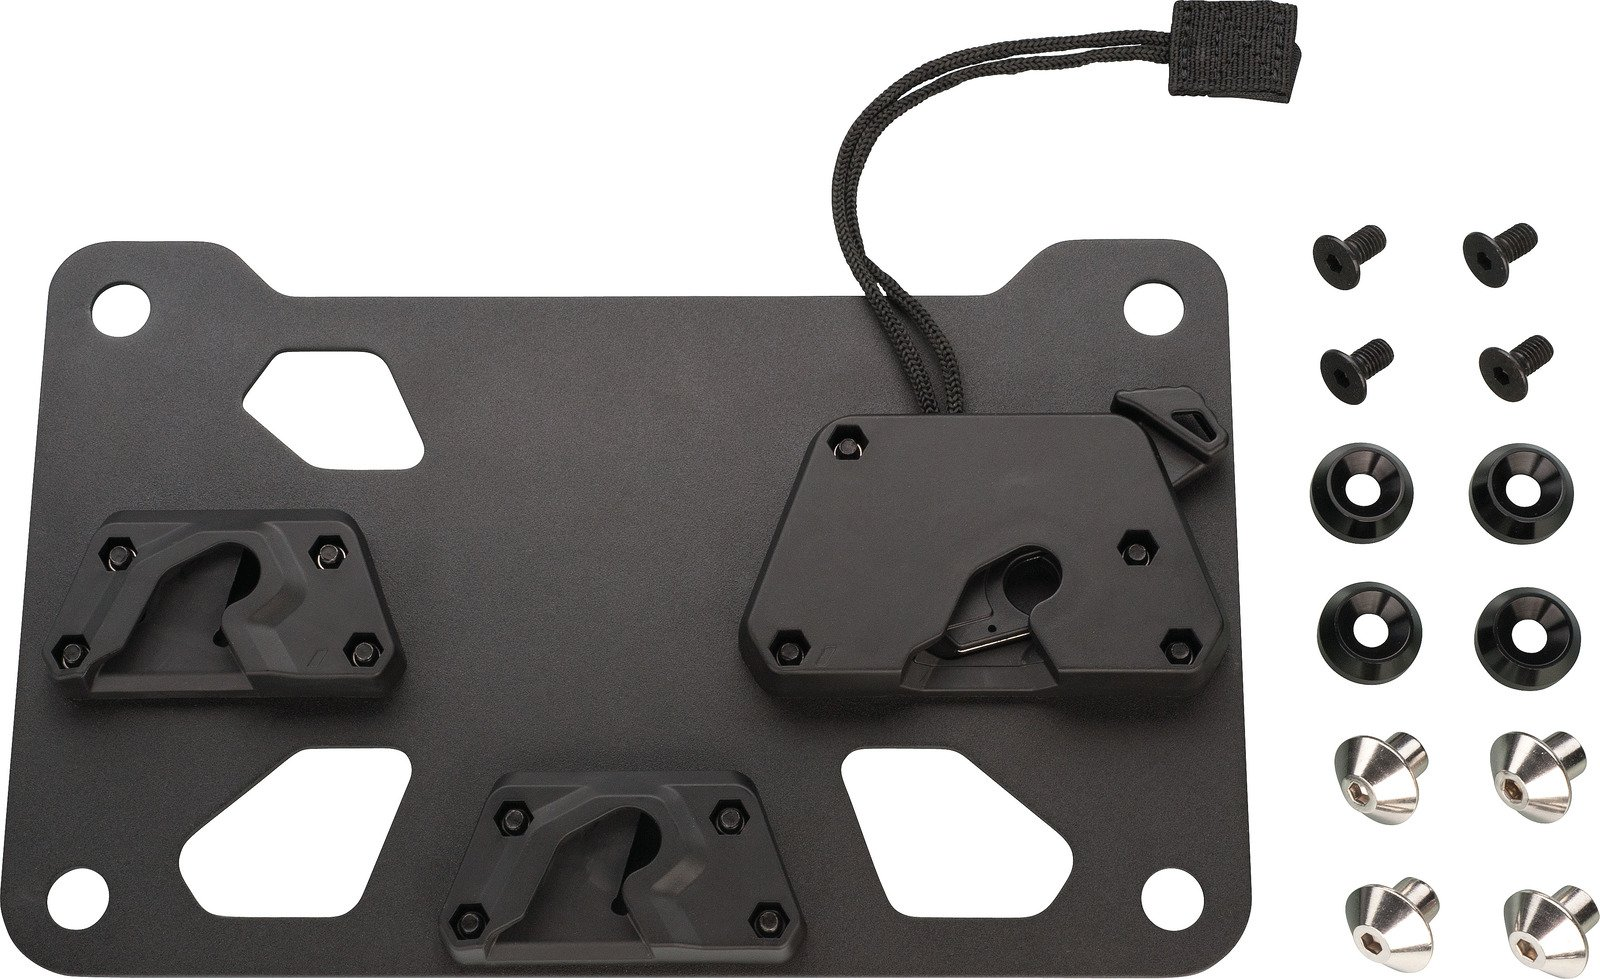 Adapter Plate for SLC Side Carrier Left